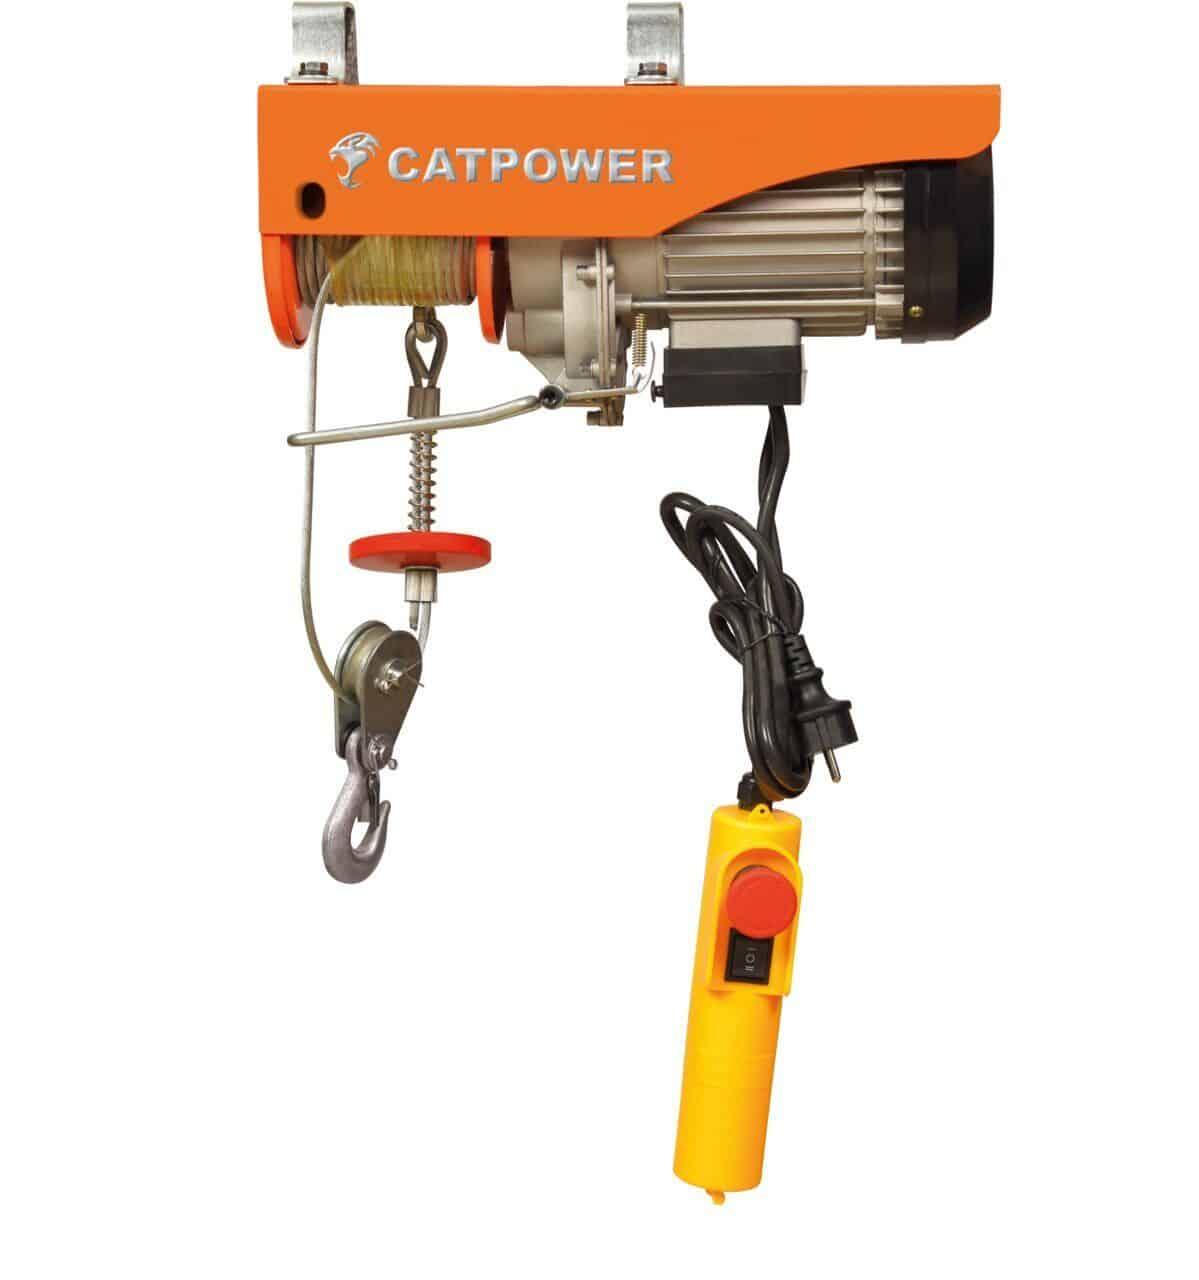 CatPower 7350 Elektrikli Vinç 250-500 kg